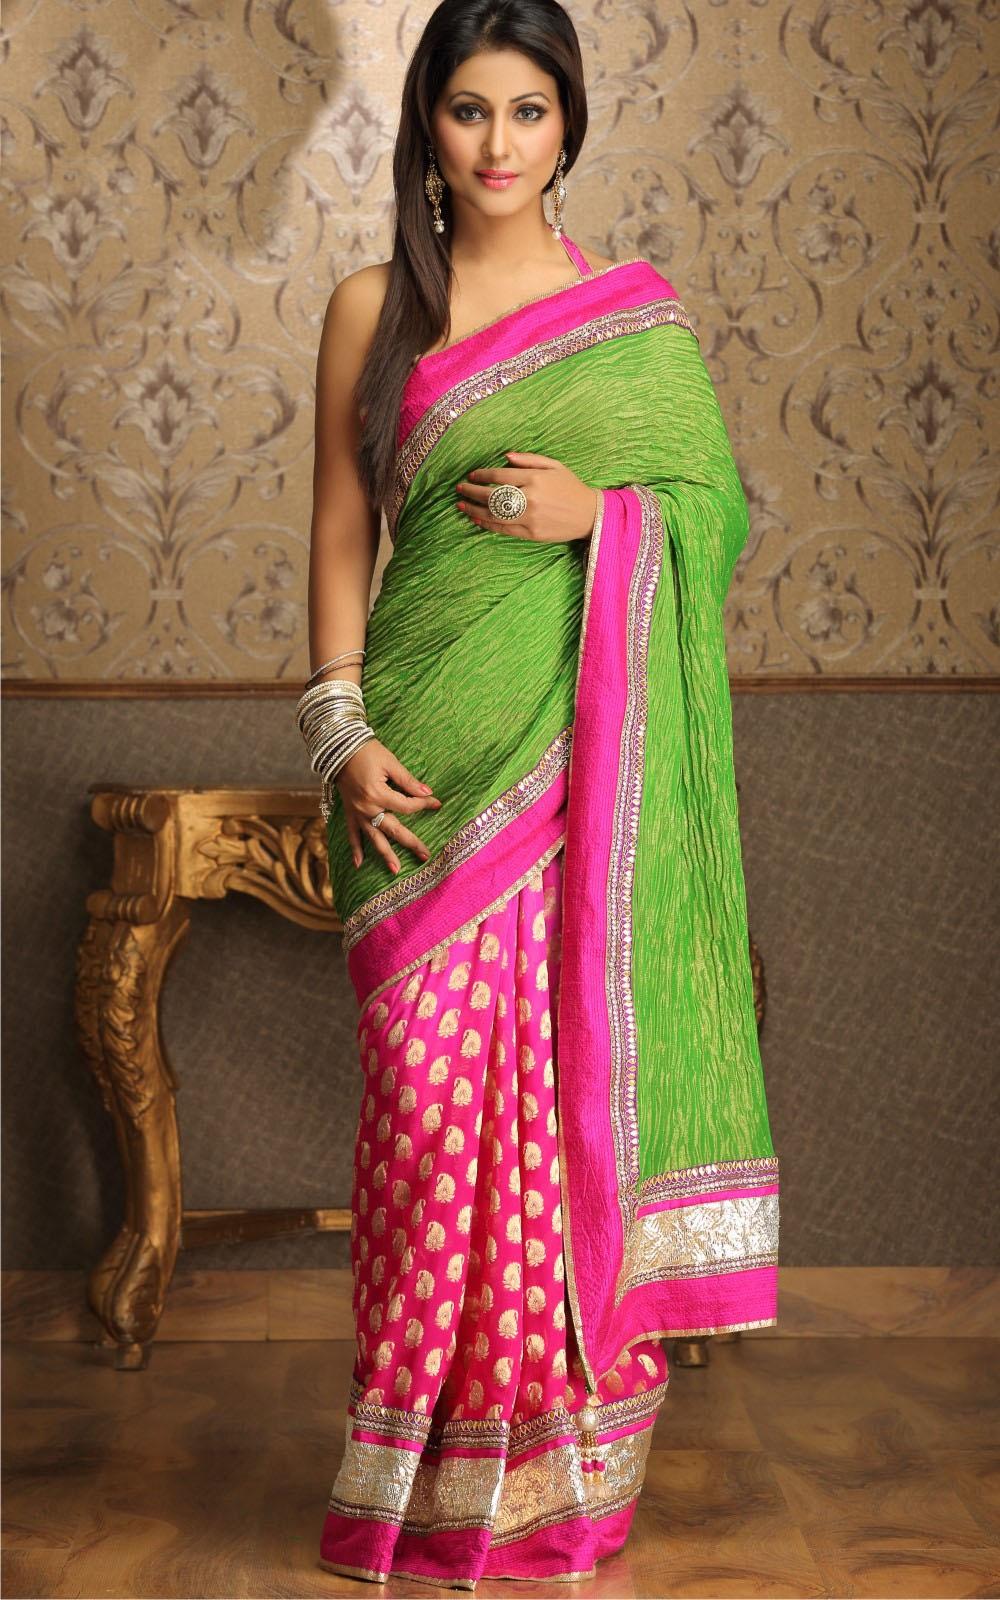 99 Fashion Style  Girls Lifestyles  Girls Clothes  Mehndi